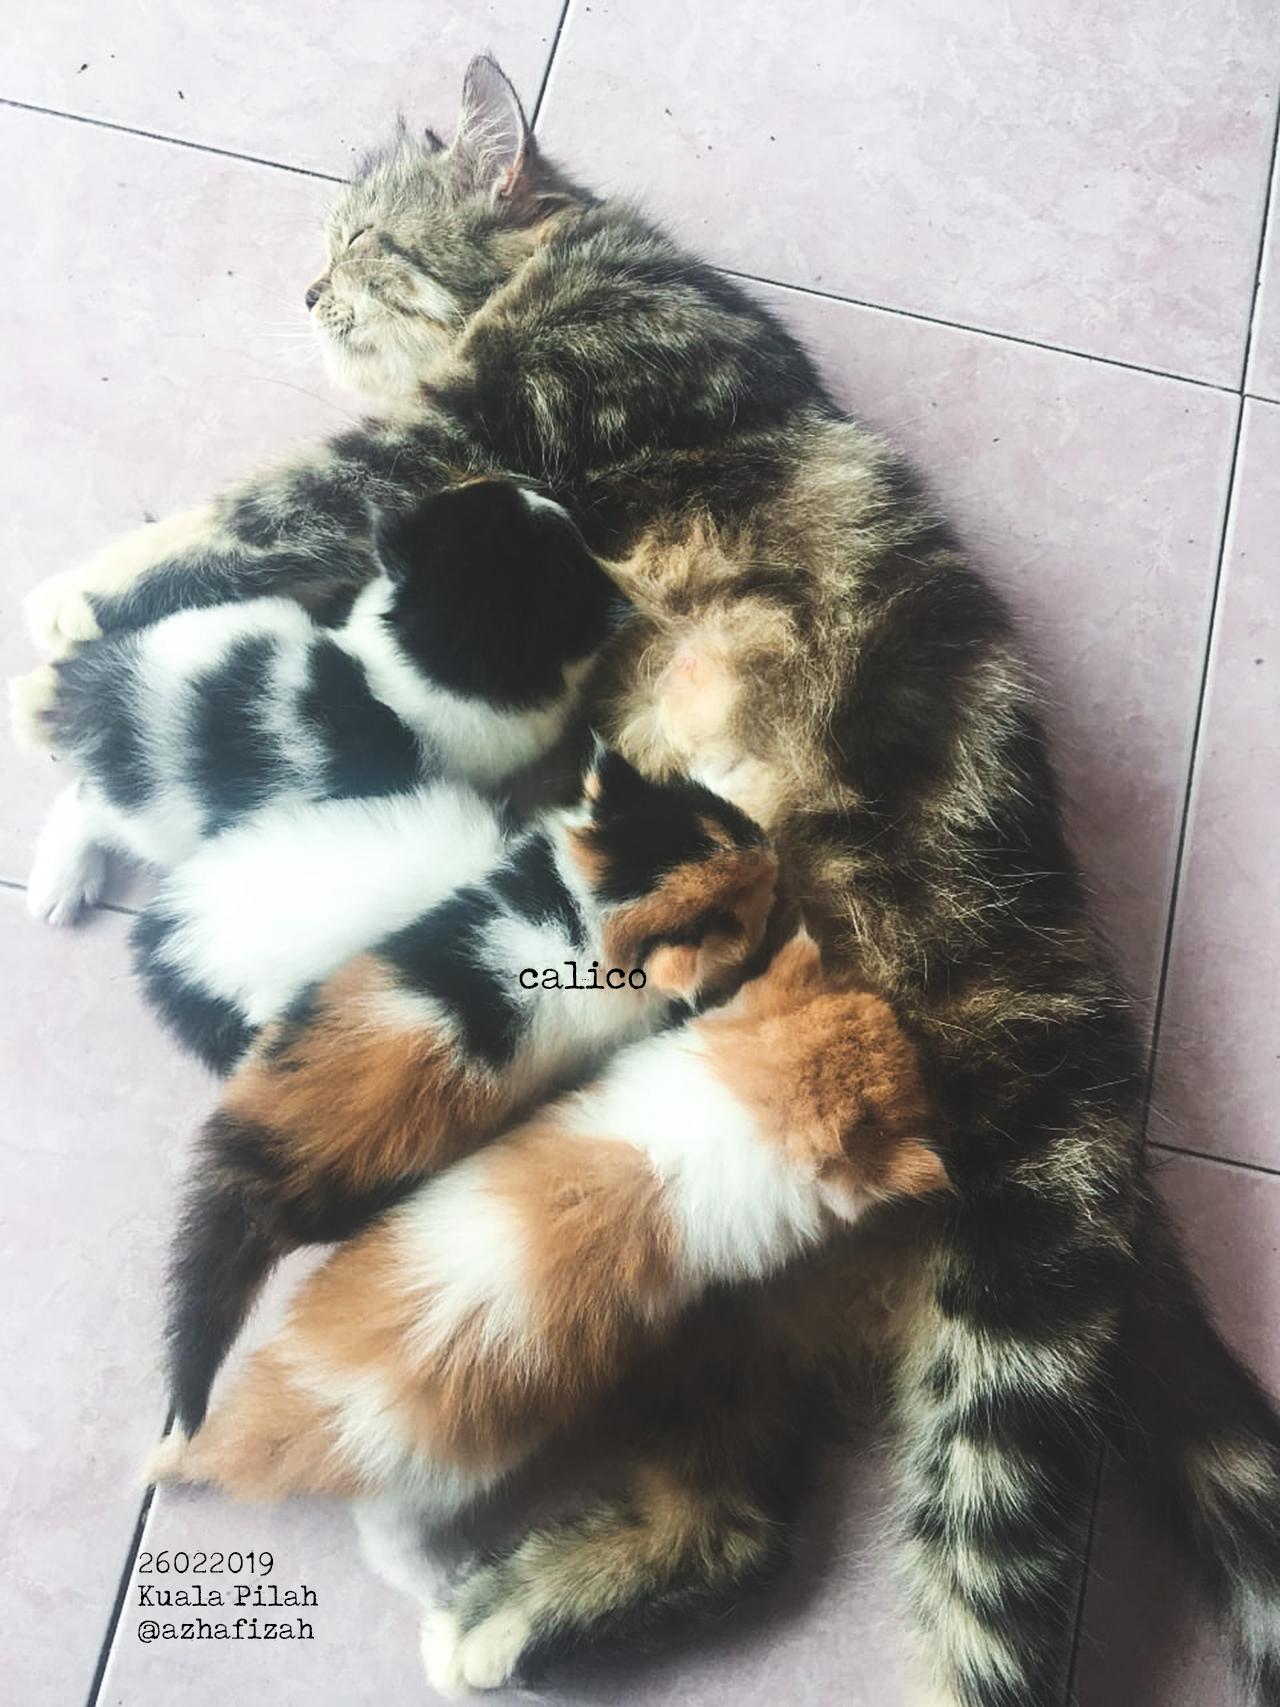 Calico, Kucing tiga warna